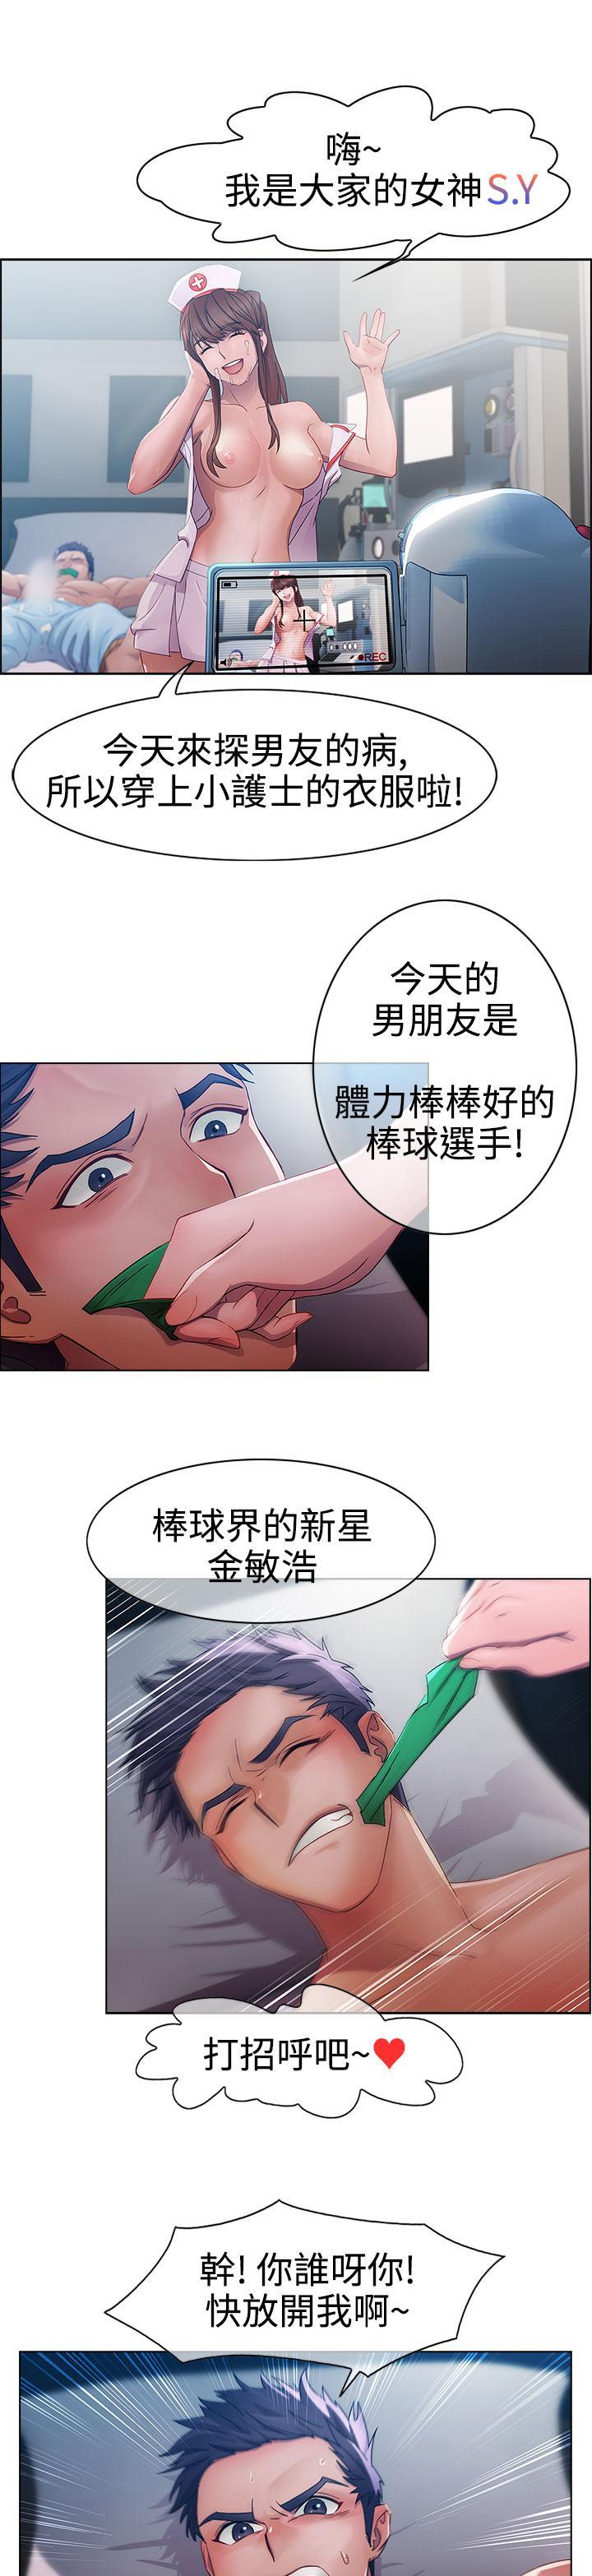 [Studio Gale] Lady Garden淑女花苑 第1話 [Chinese]中文 5